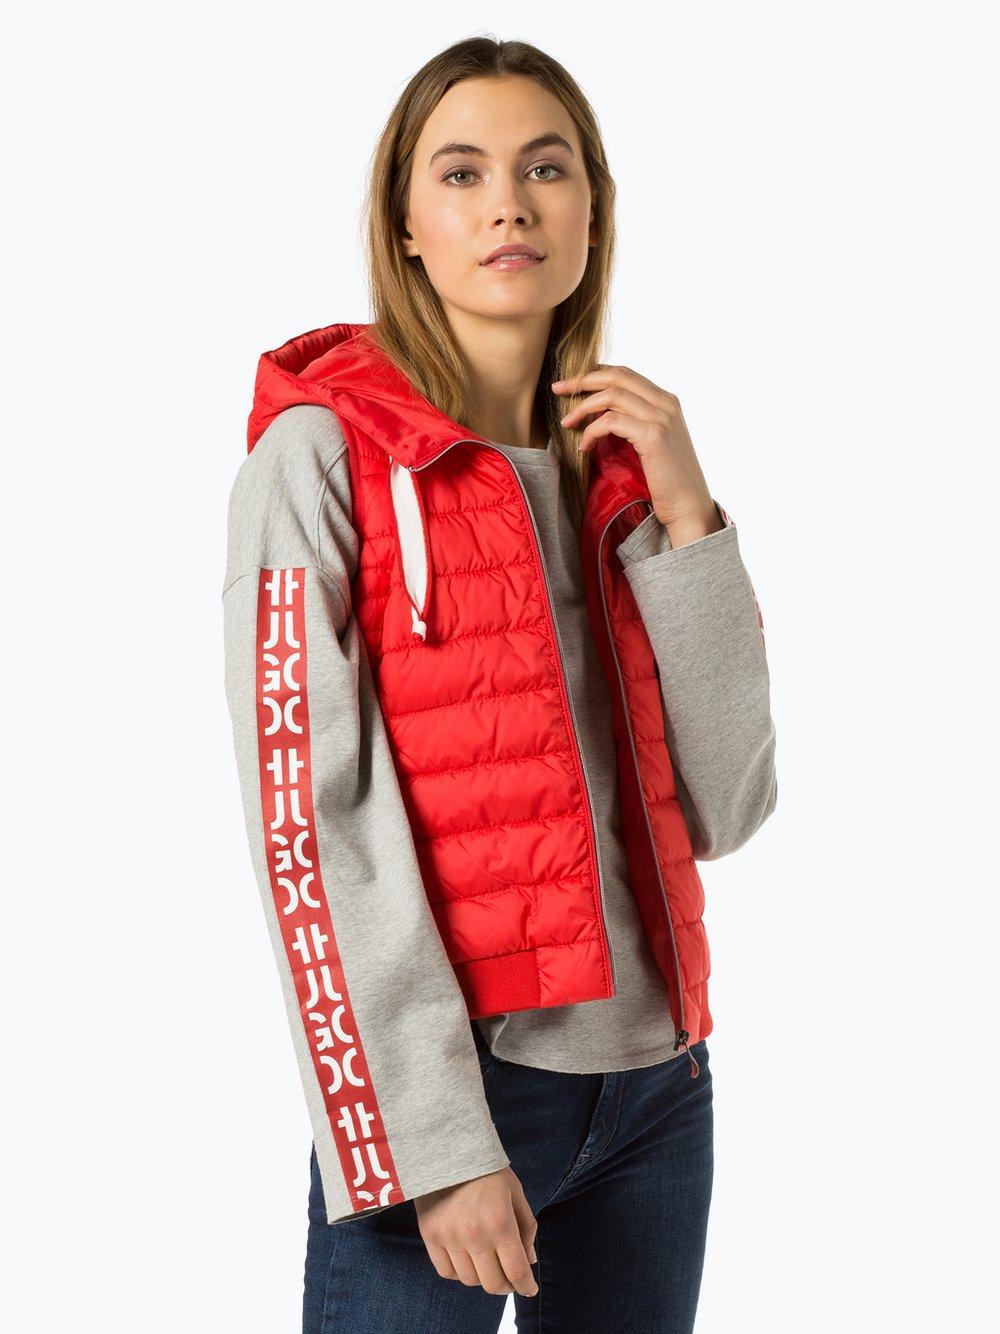 8817c5da752450 Taifun Damen Weste online kaufen | VANGRAAF.COM